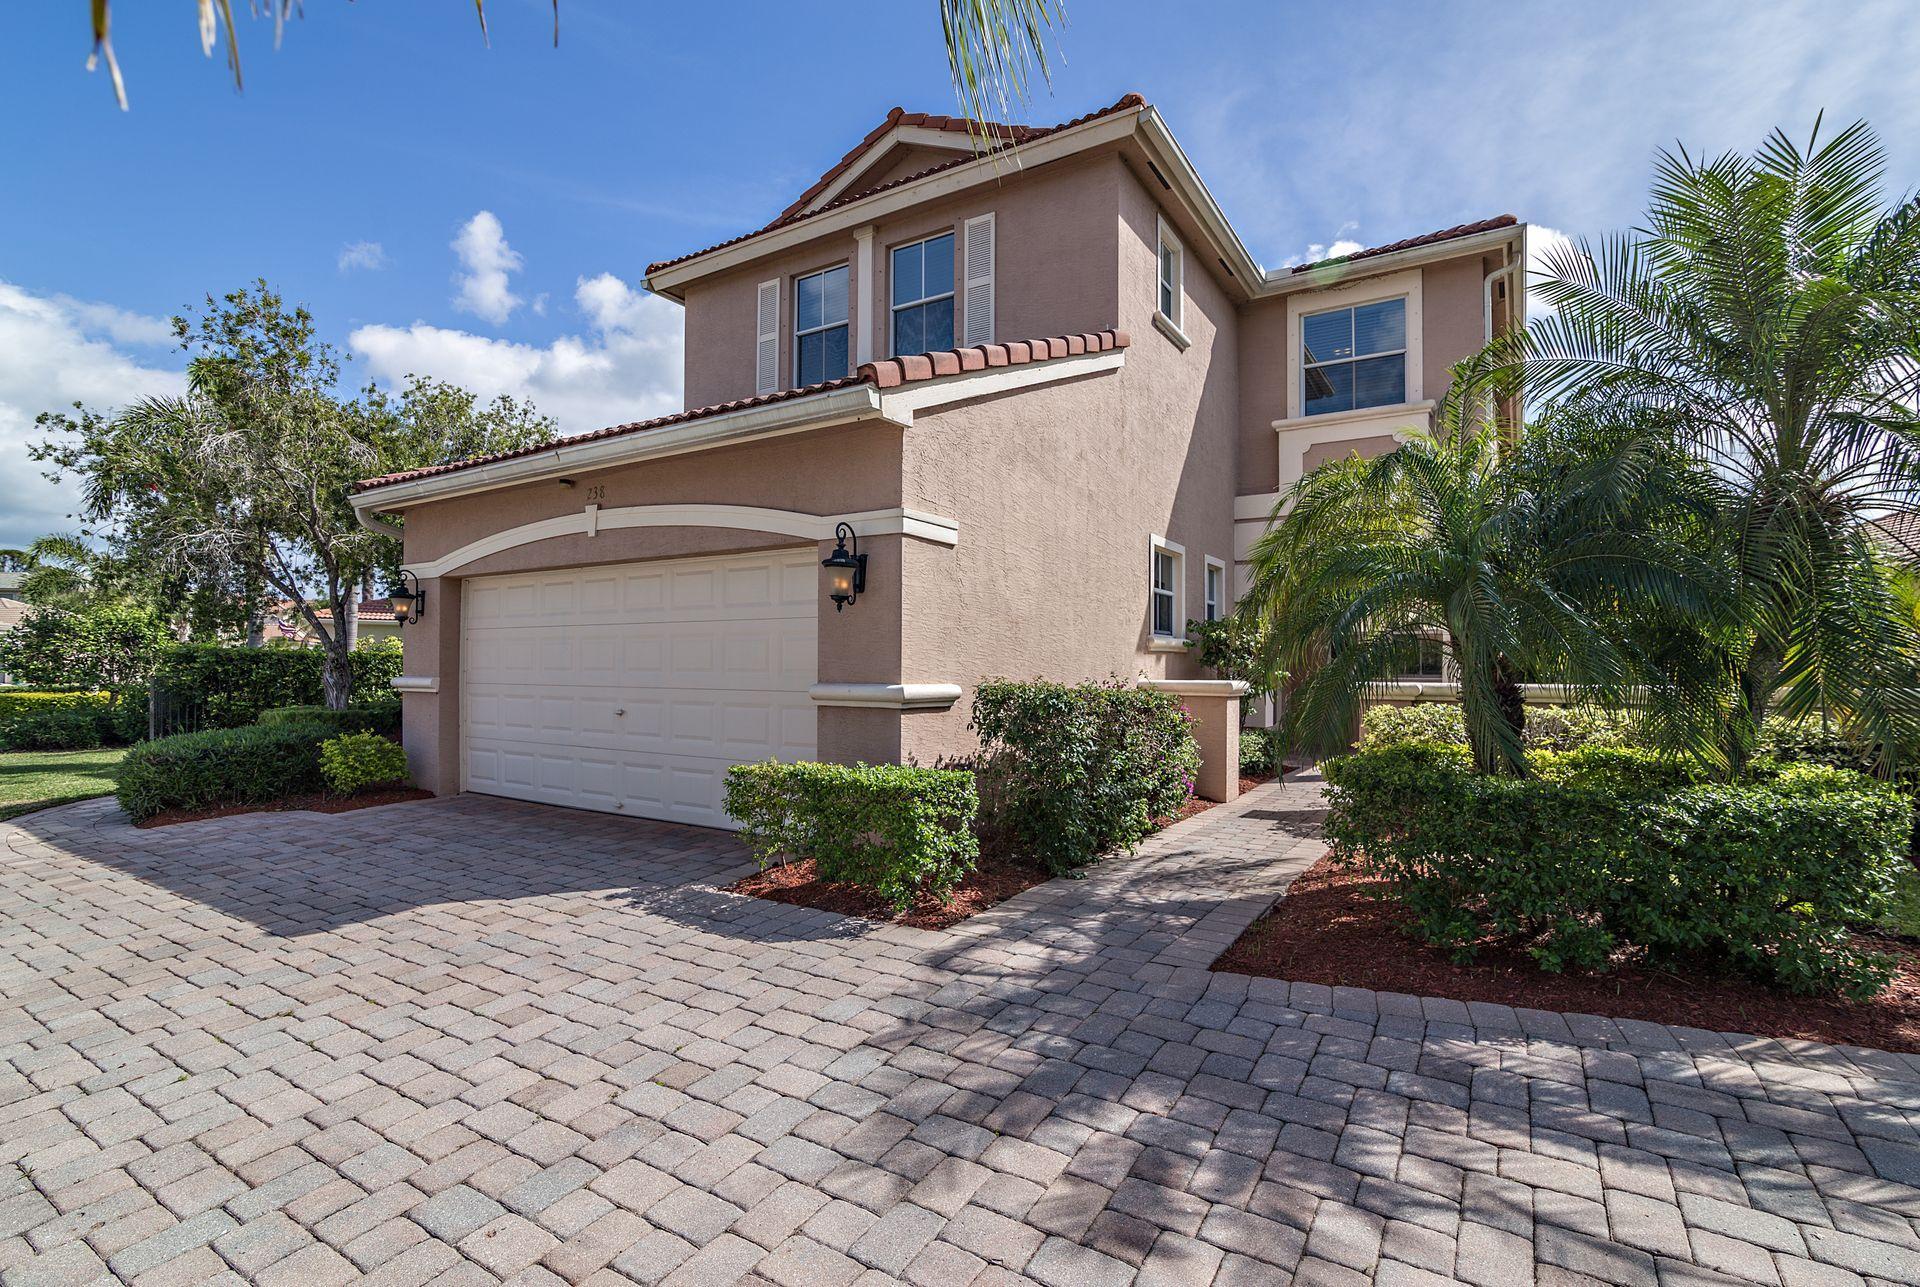 238 Isle Verde Way - 33418 - FL - Palm Beach Gardens